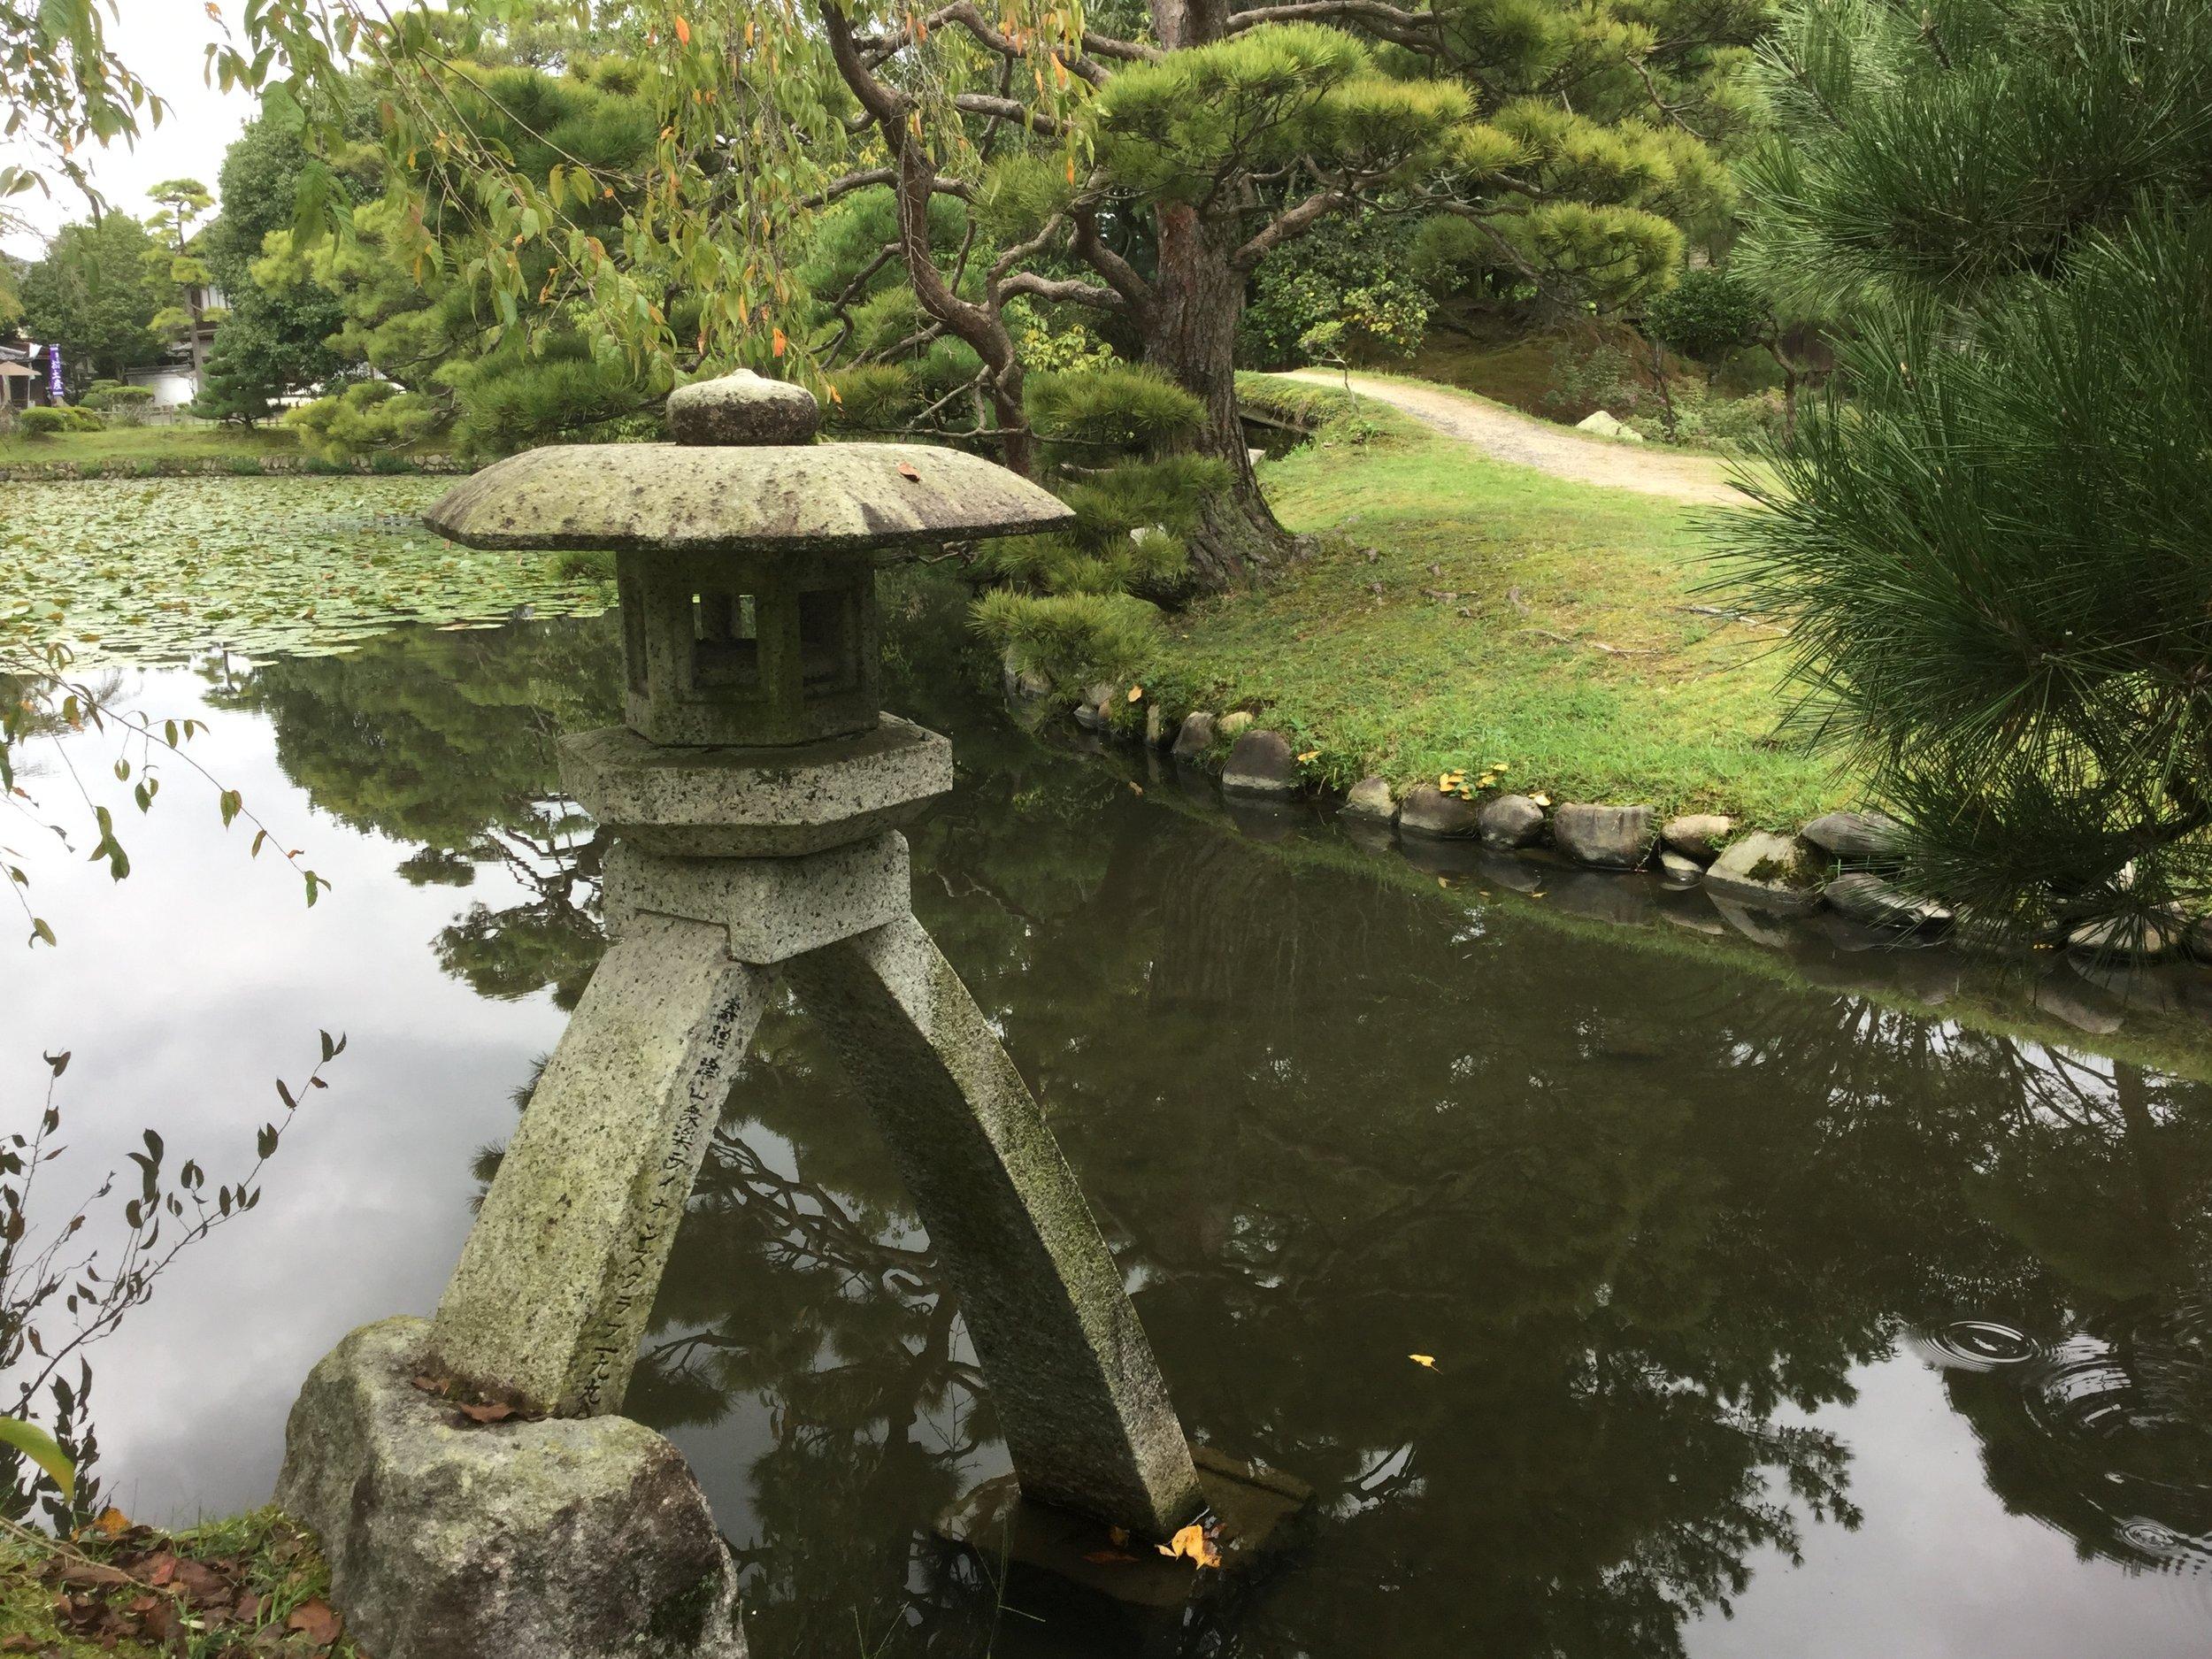 Ishidoro lantern by the tea pavilion